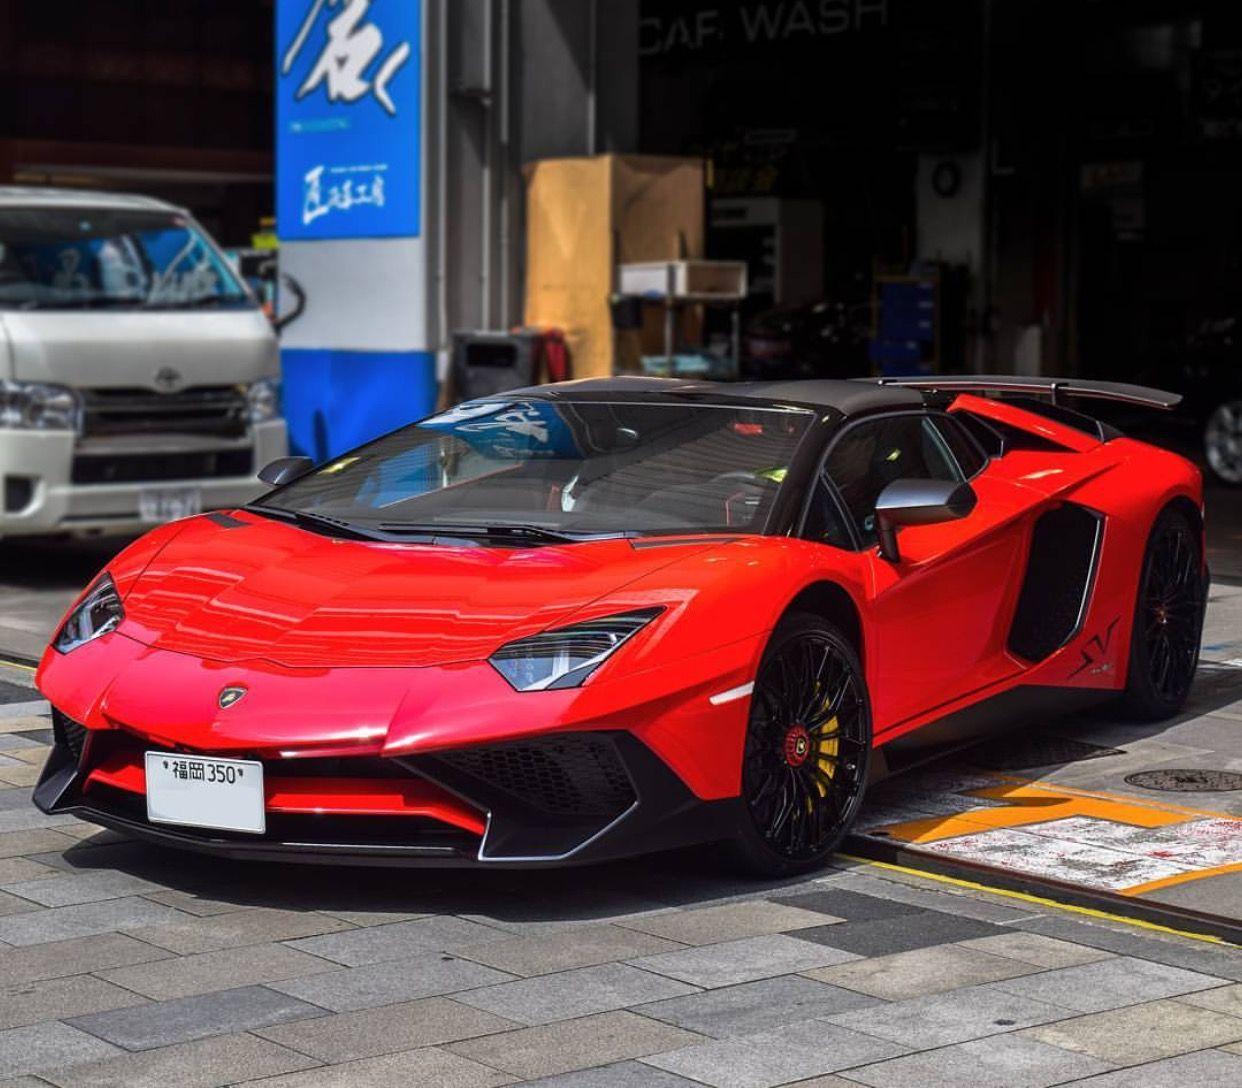 Lamborghini Sport: Lamborghini Aventador Super Veloce Roadster Painted In